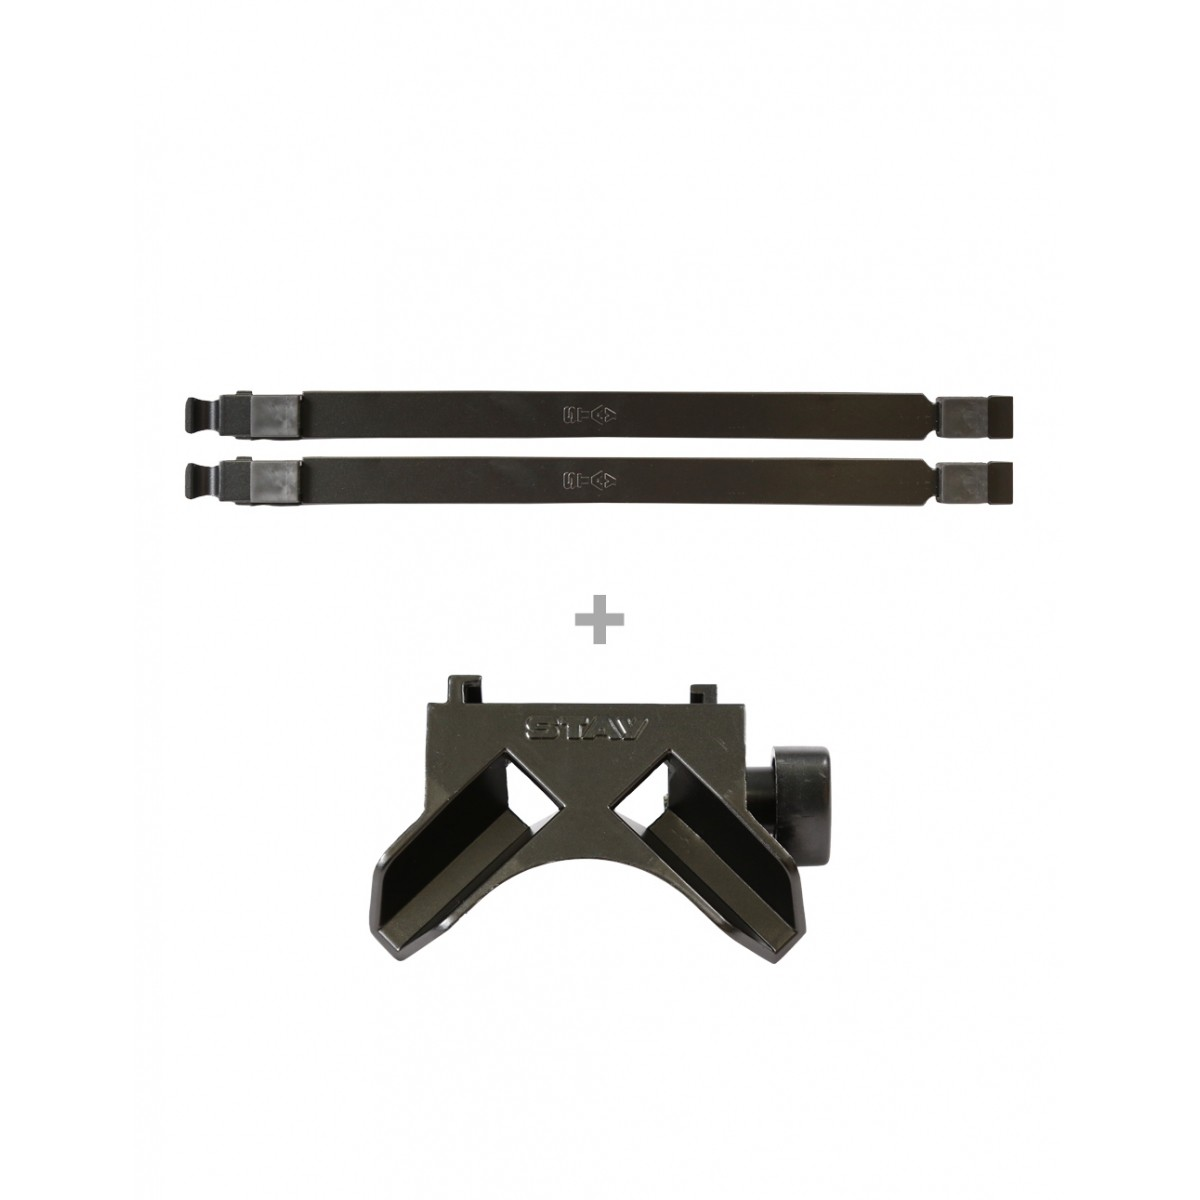 Kit - Braços p/ Slim ou Compact (longarinas) 38cm + Base Reta p/ Slim ou Compact